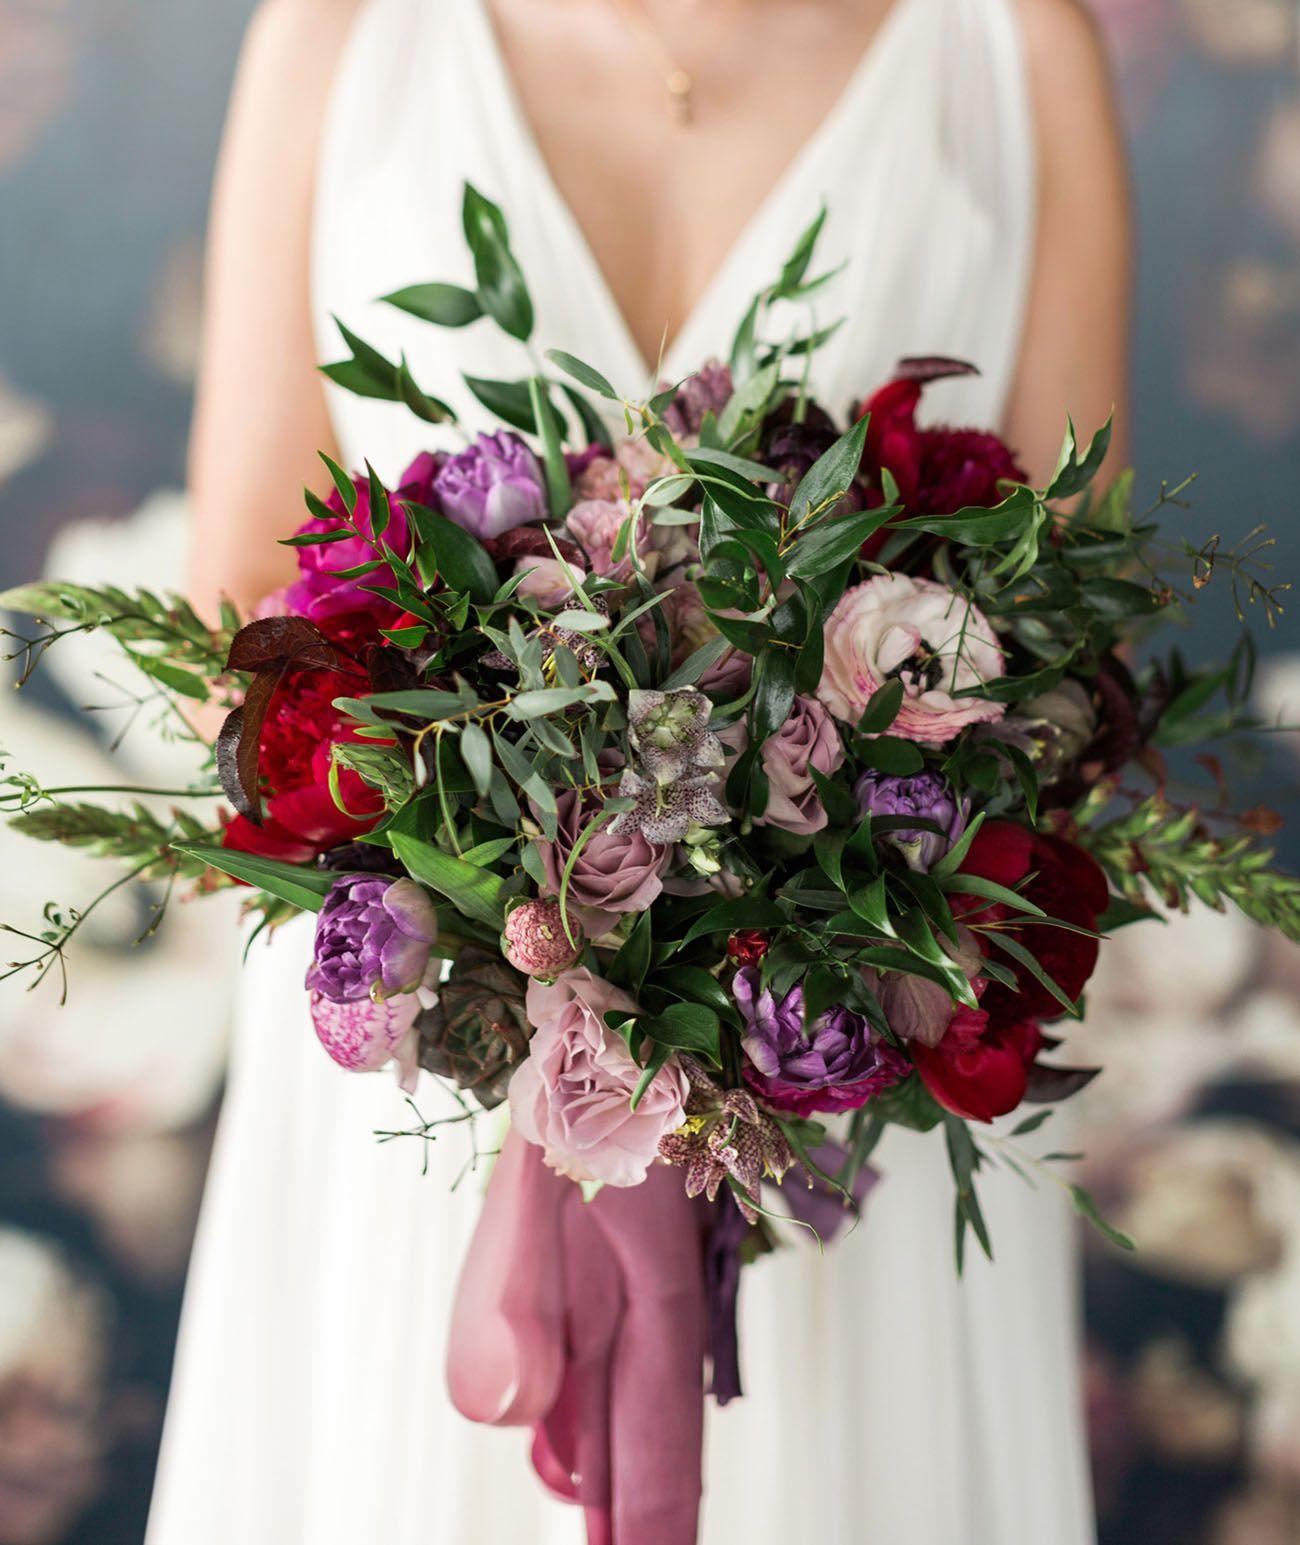 The Pink Purple Wedding For Rachel Of Course: Industrial, Art-Inspired Wedding: Rachel + Taylor